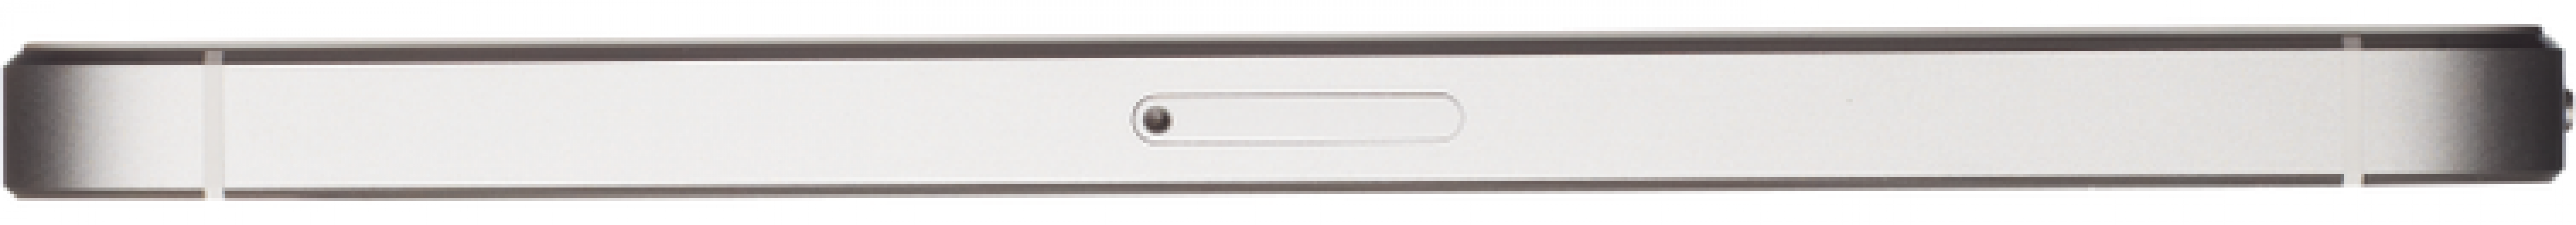 Apple iPhone 5 SIM slot